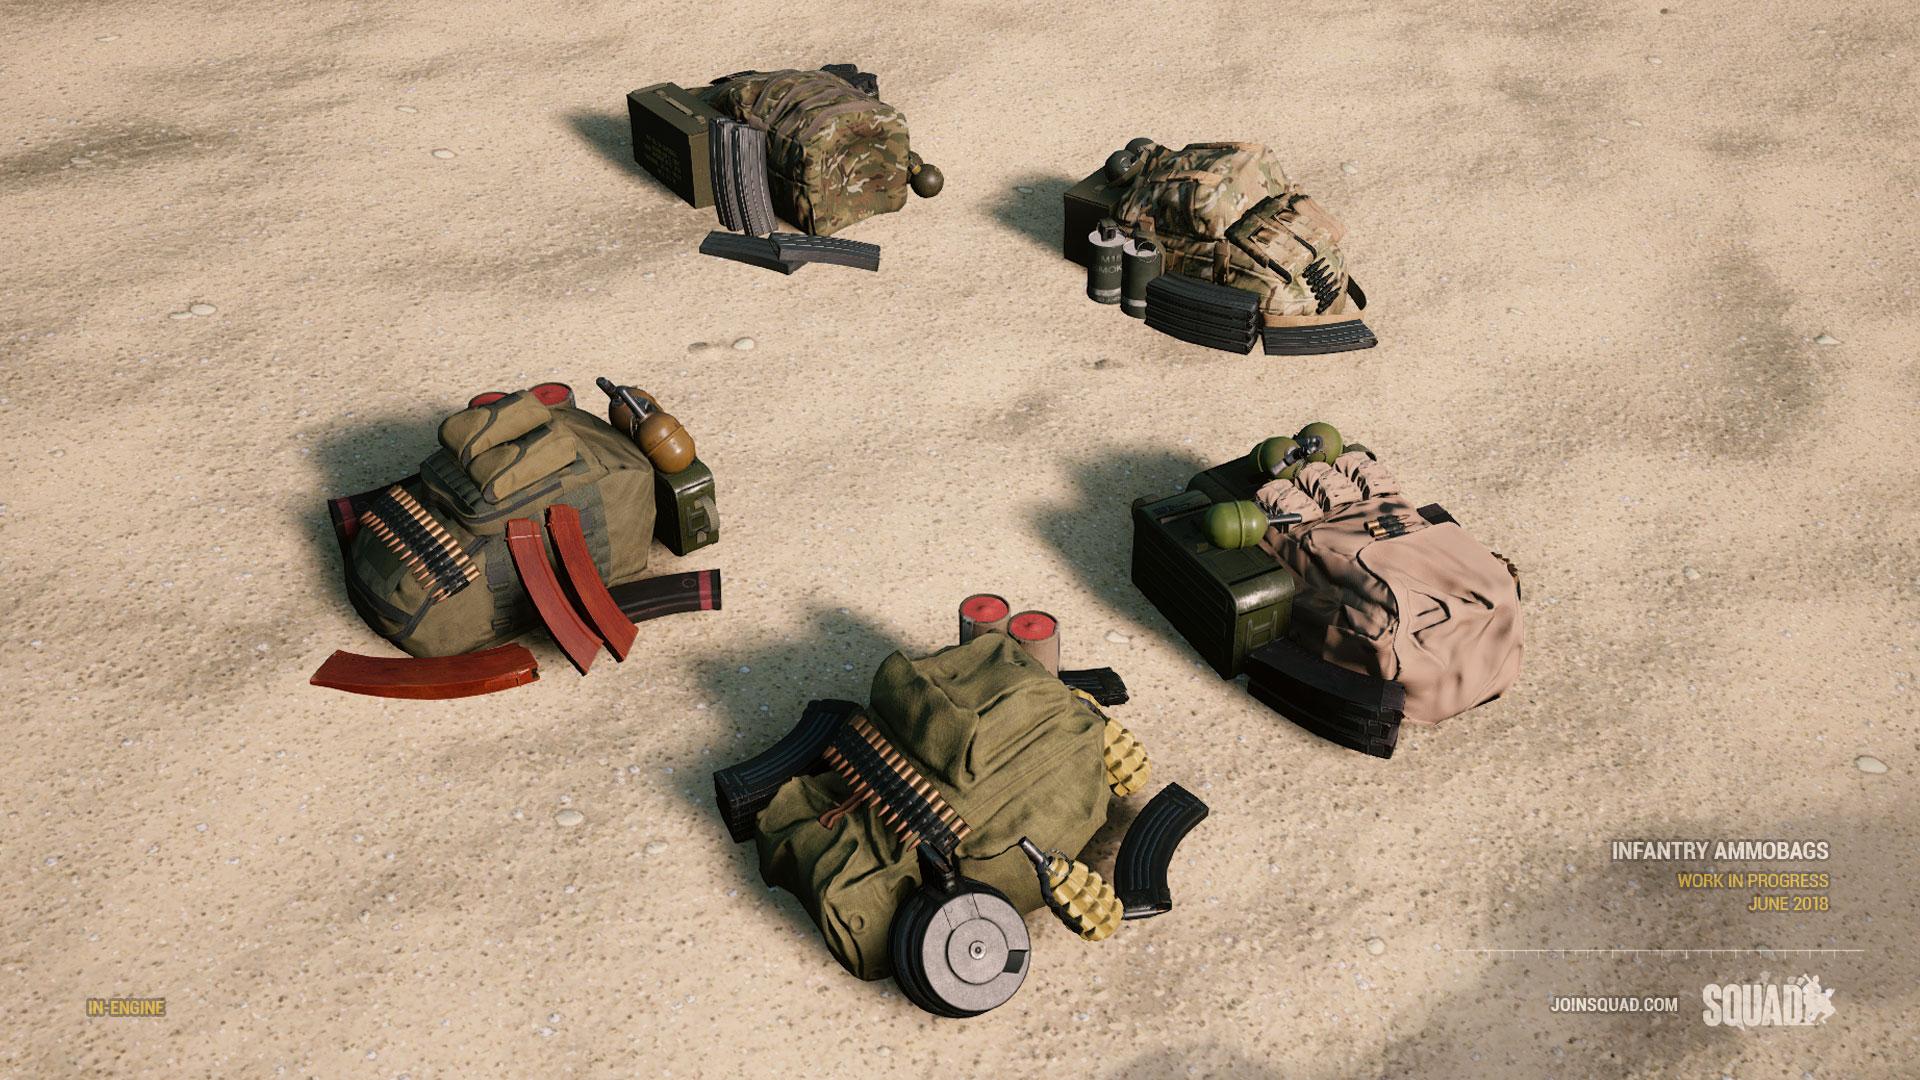 ammobags.jpg